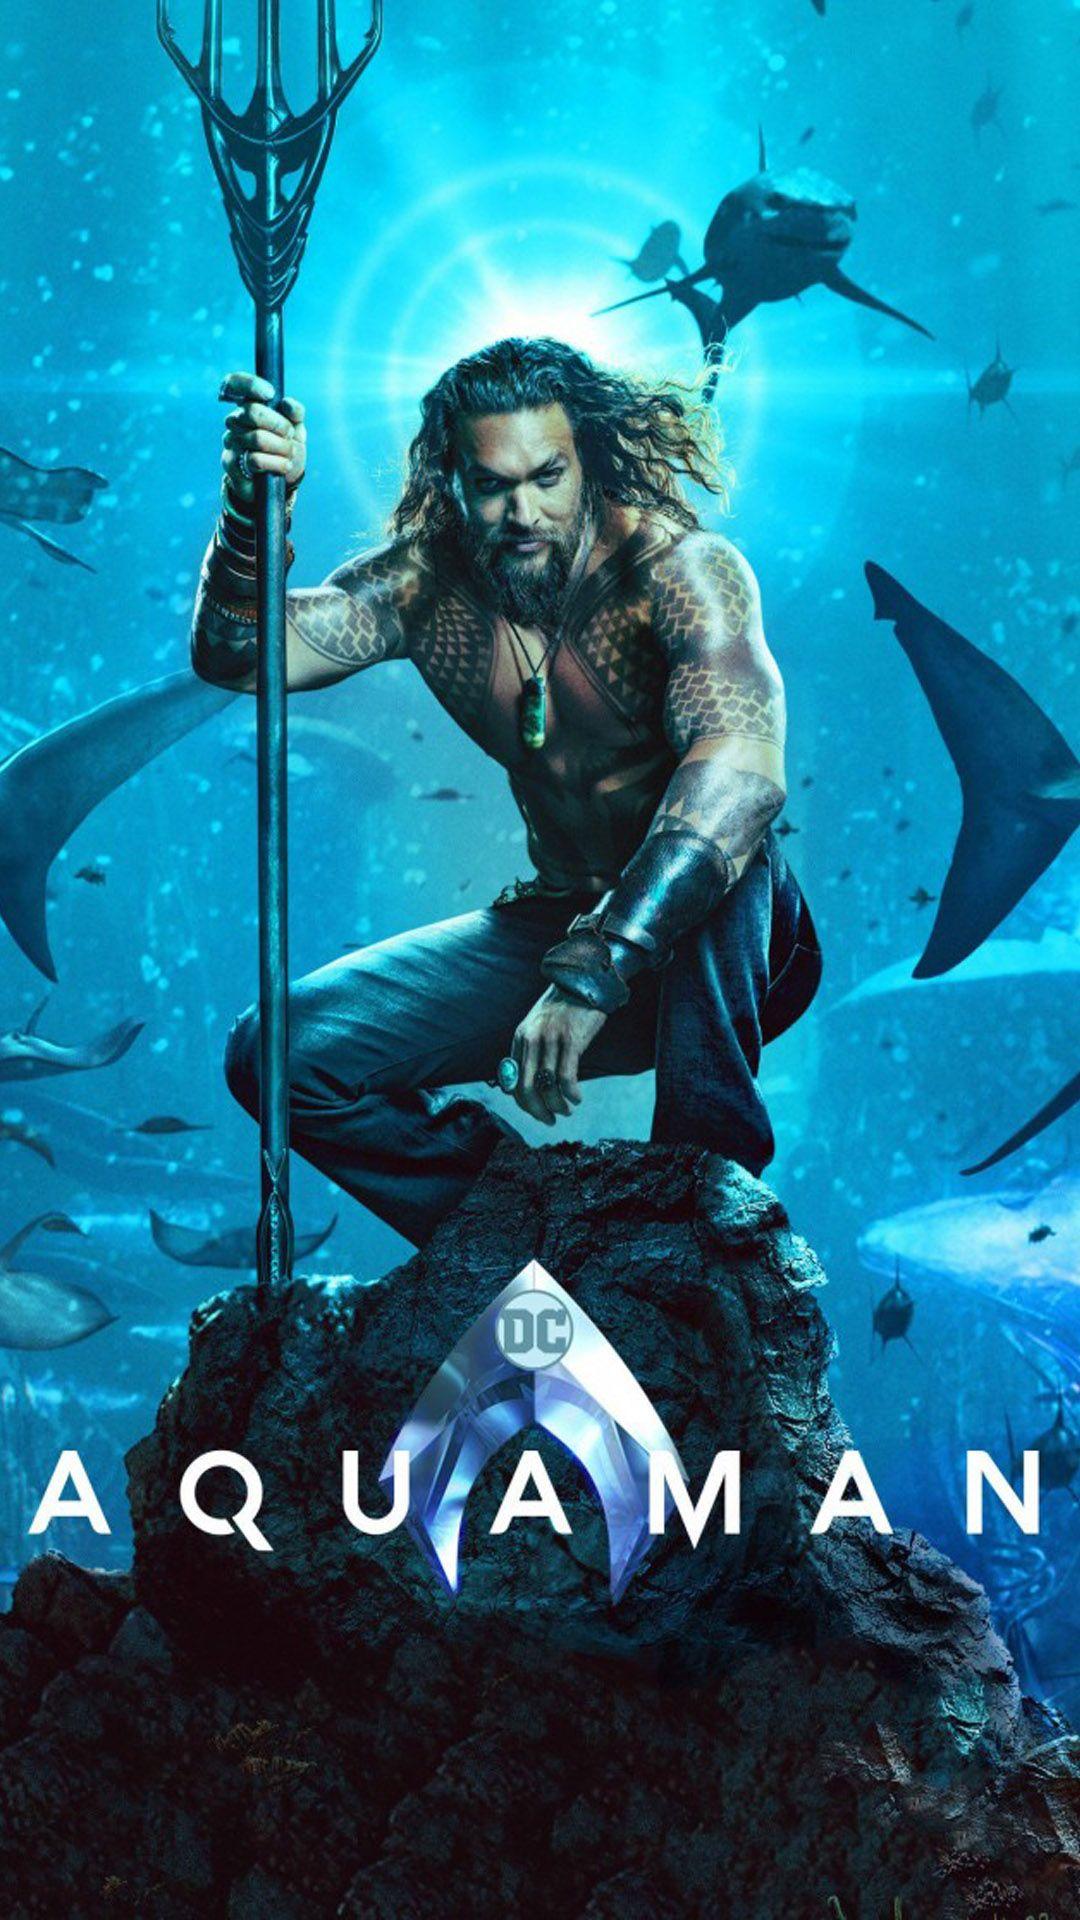 jason momoa in aquaman 2018 | movie wallpapers | pinterest | aquaman